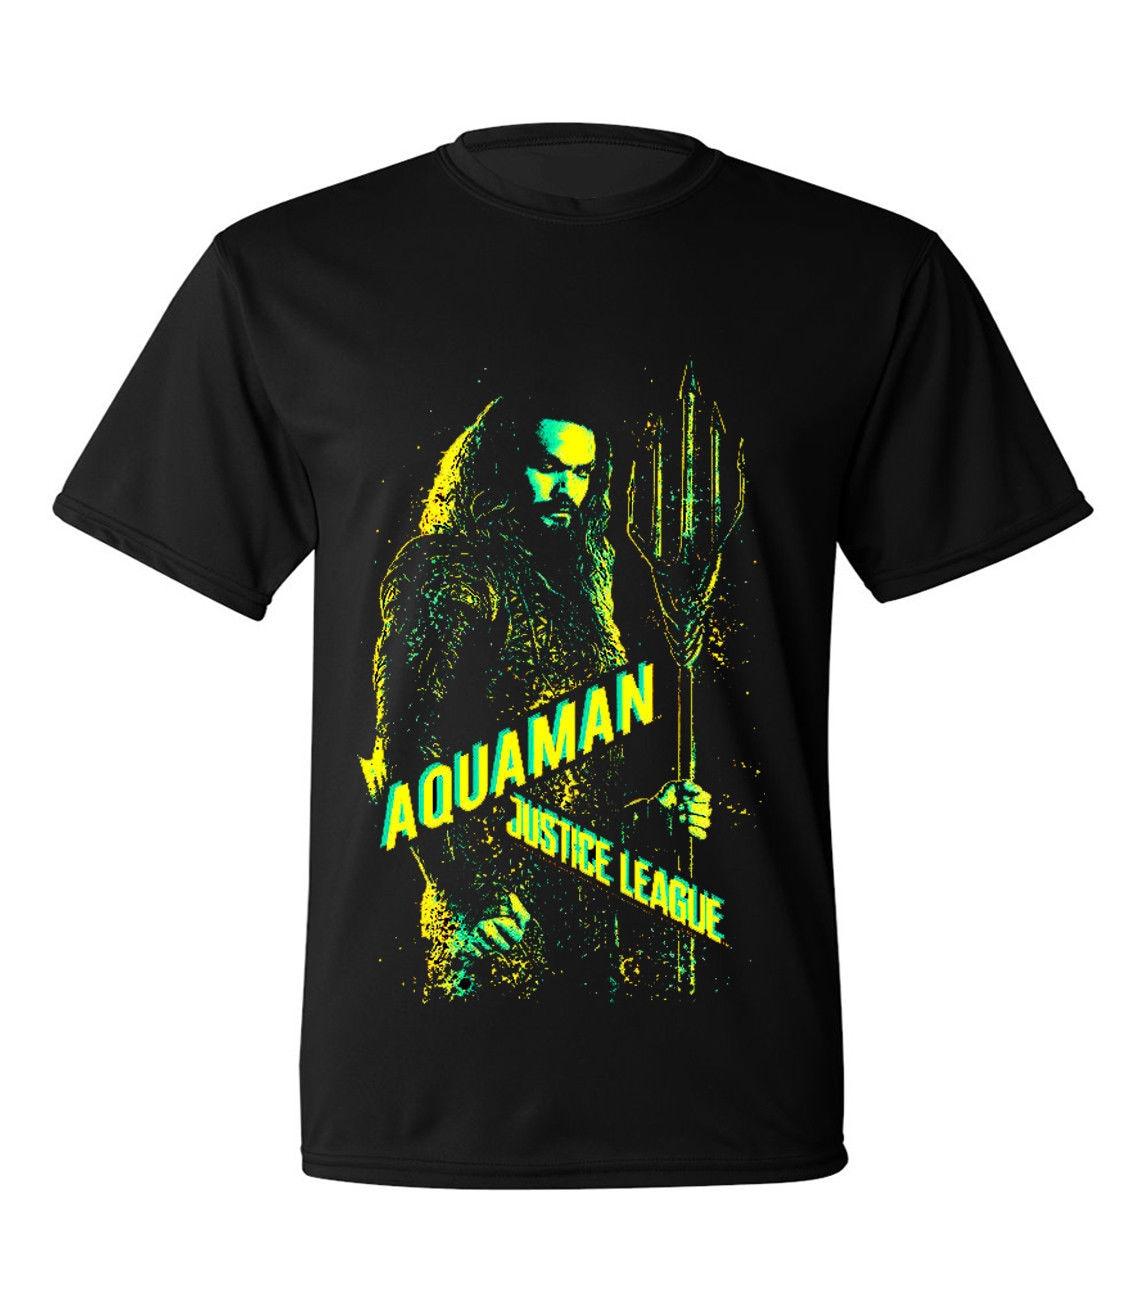 Gildan Justice League Movie Aquaman T-shirts for Men Women or Kids New